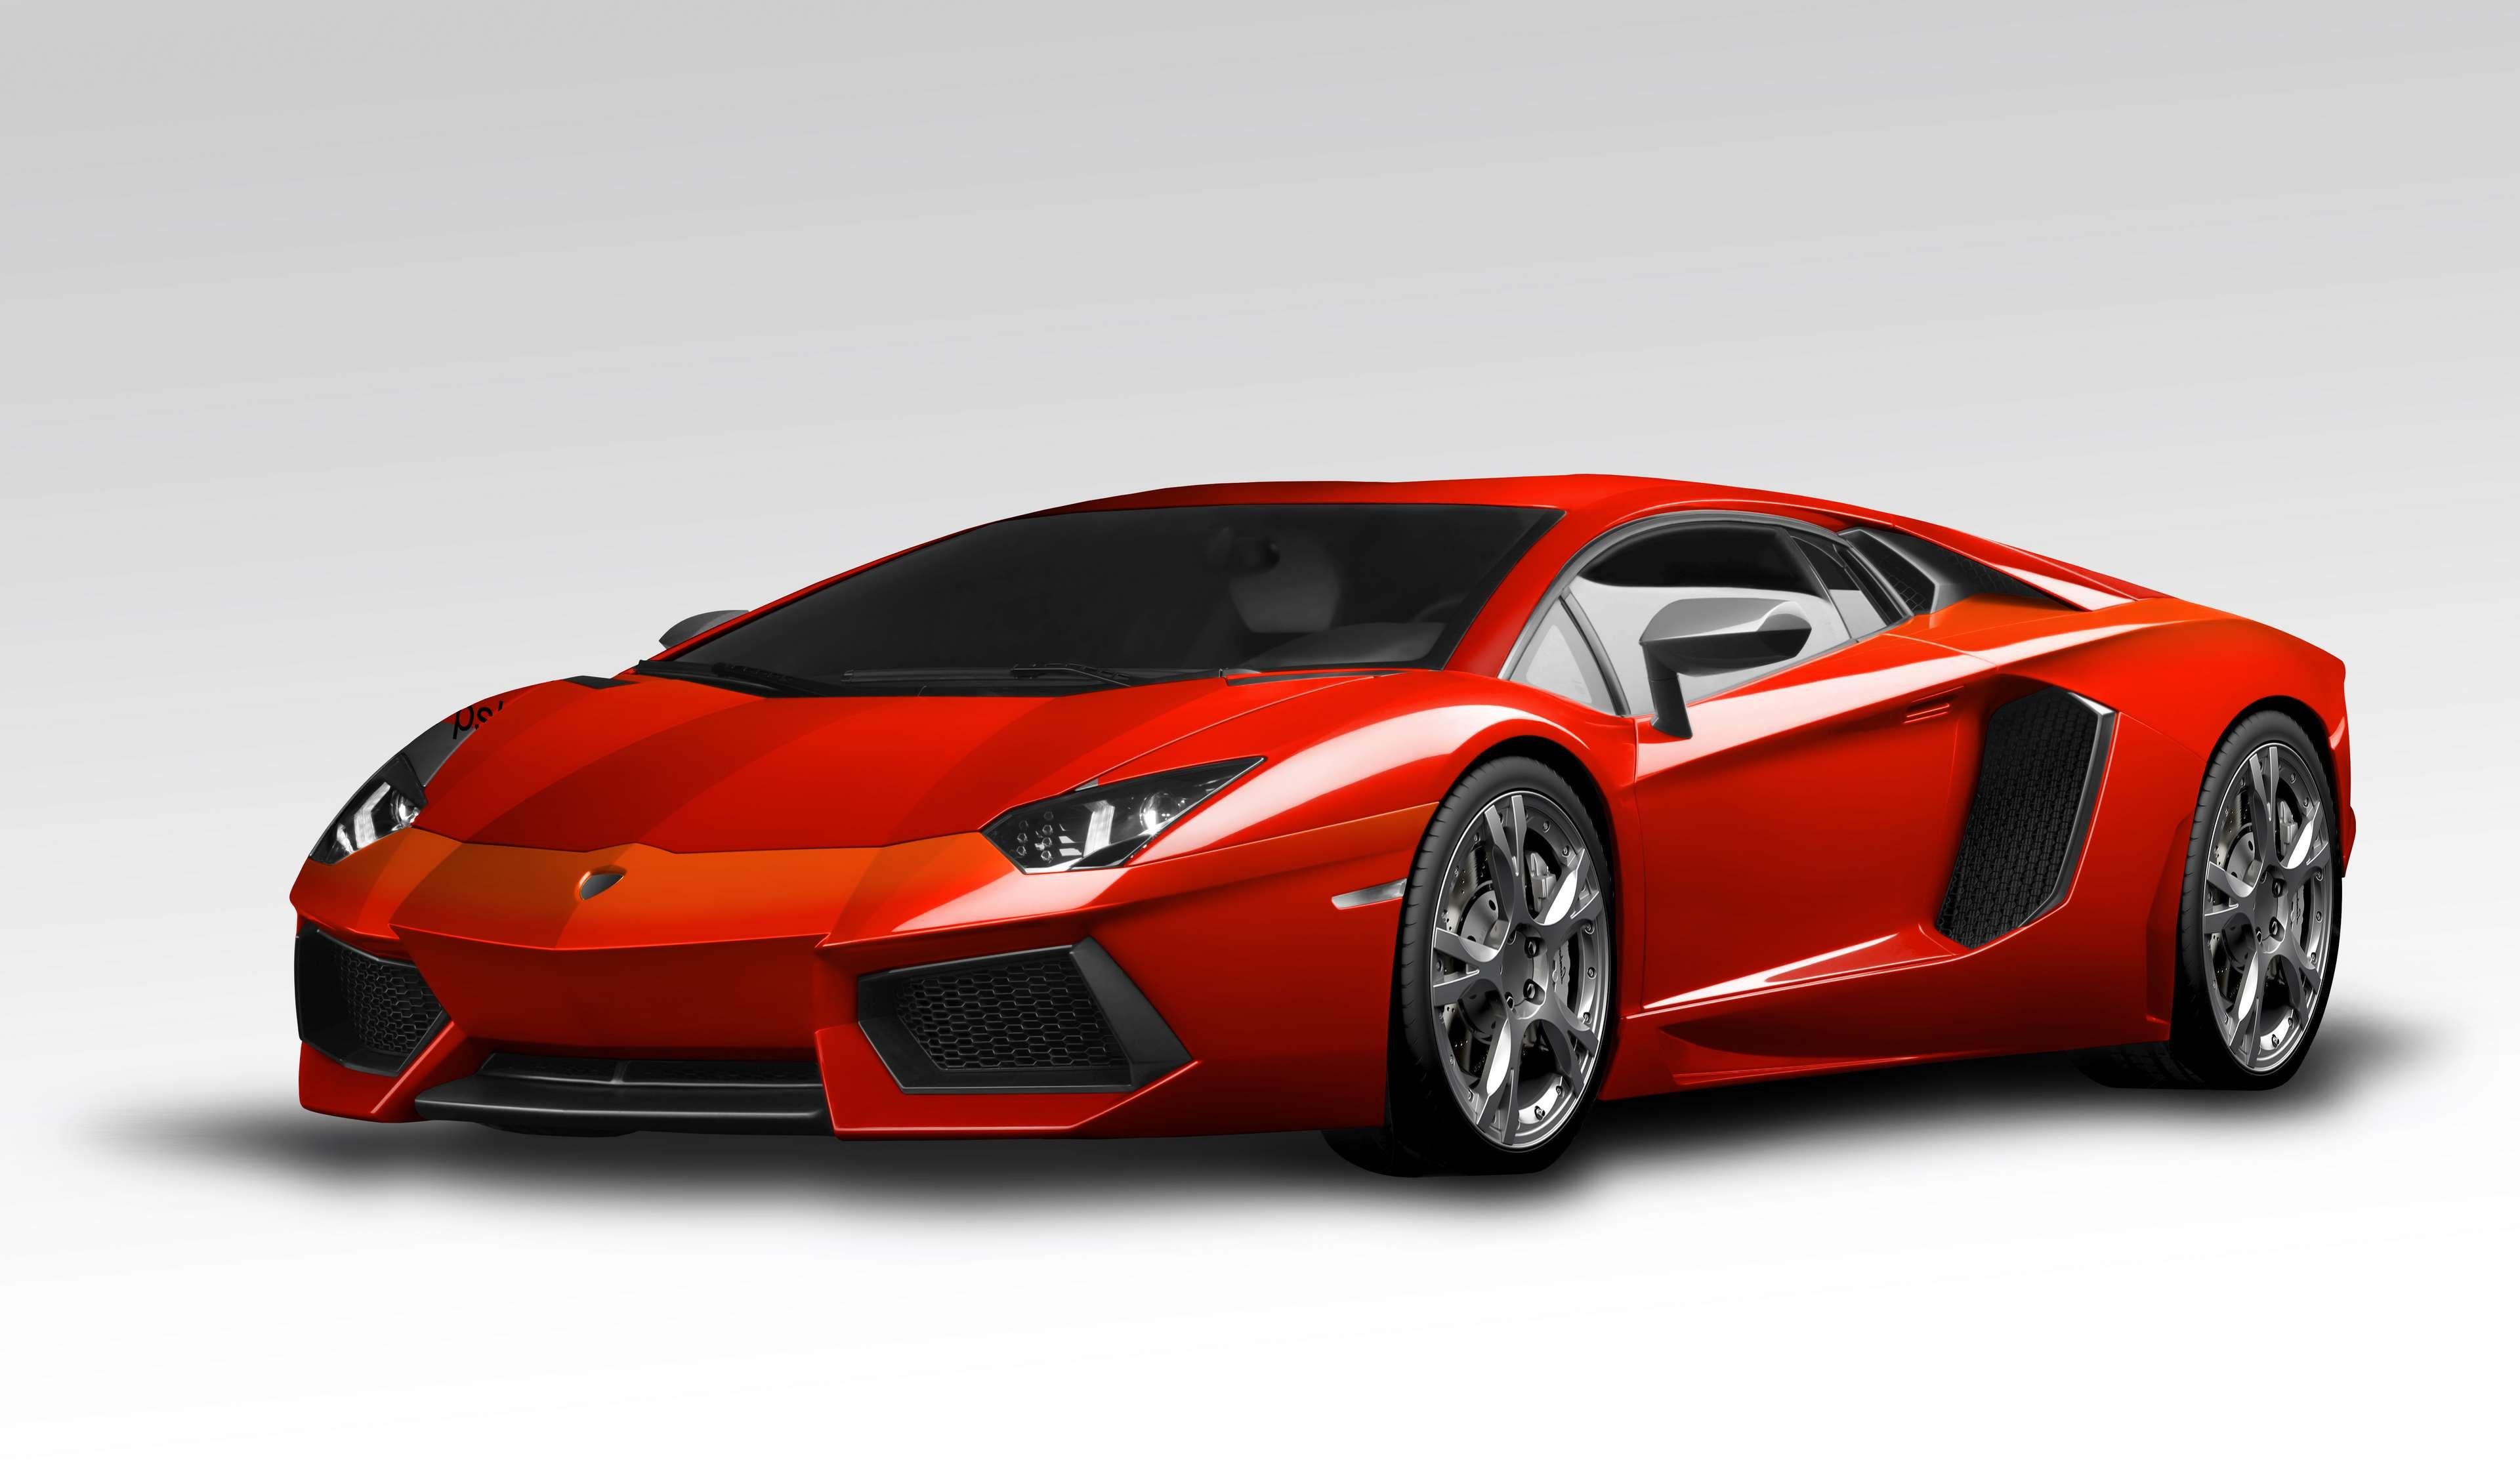 car cars aventador luxury car red sport